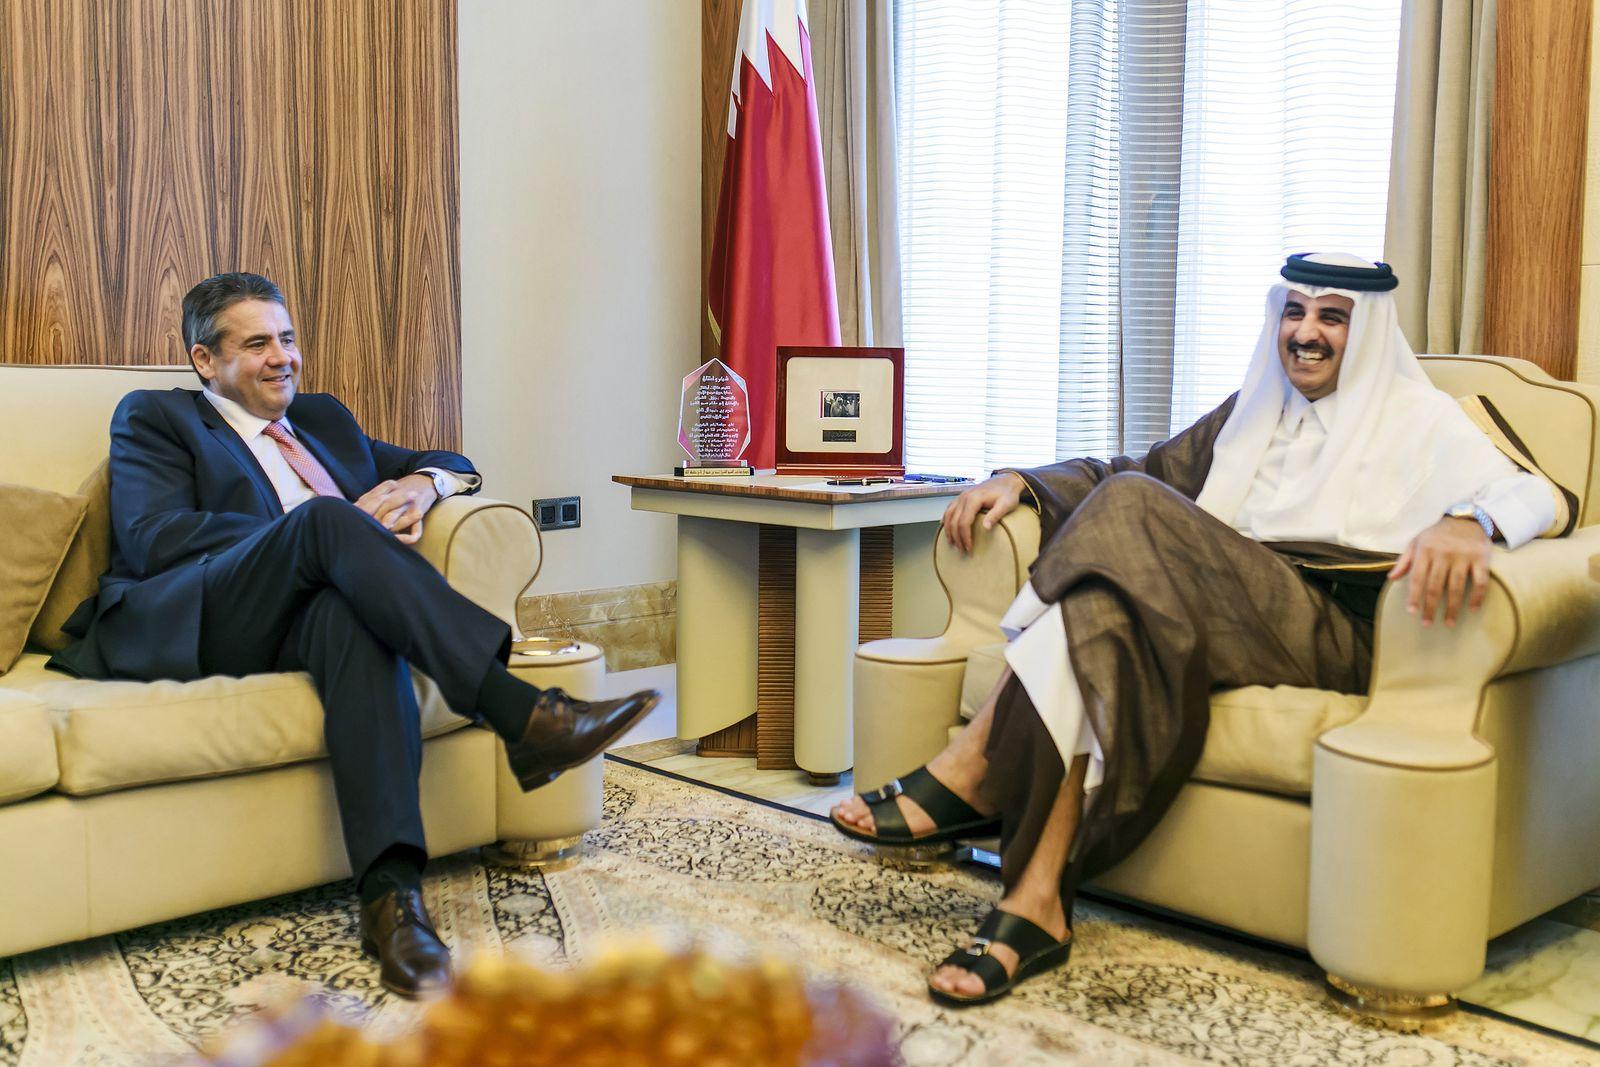 Sigmar Gabriel / Scheich Tamim bin Hamad bin Khalifa Al Thani Dohar